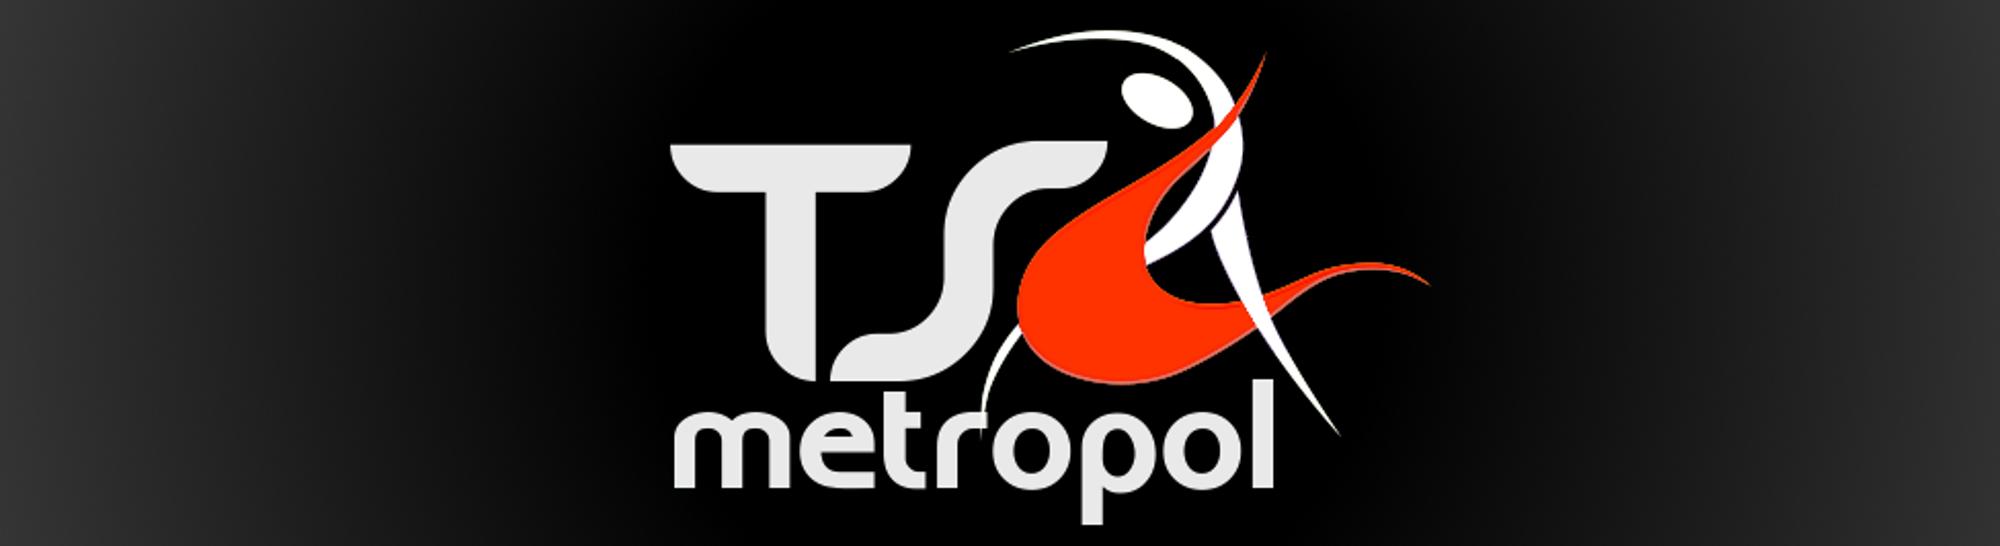 Tanzsportclub Metropol München e.V. IMAGE